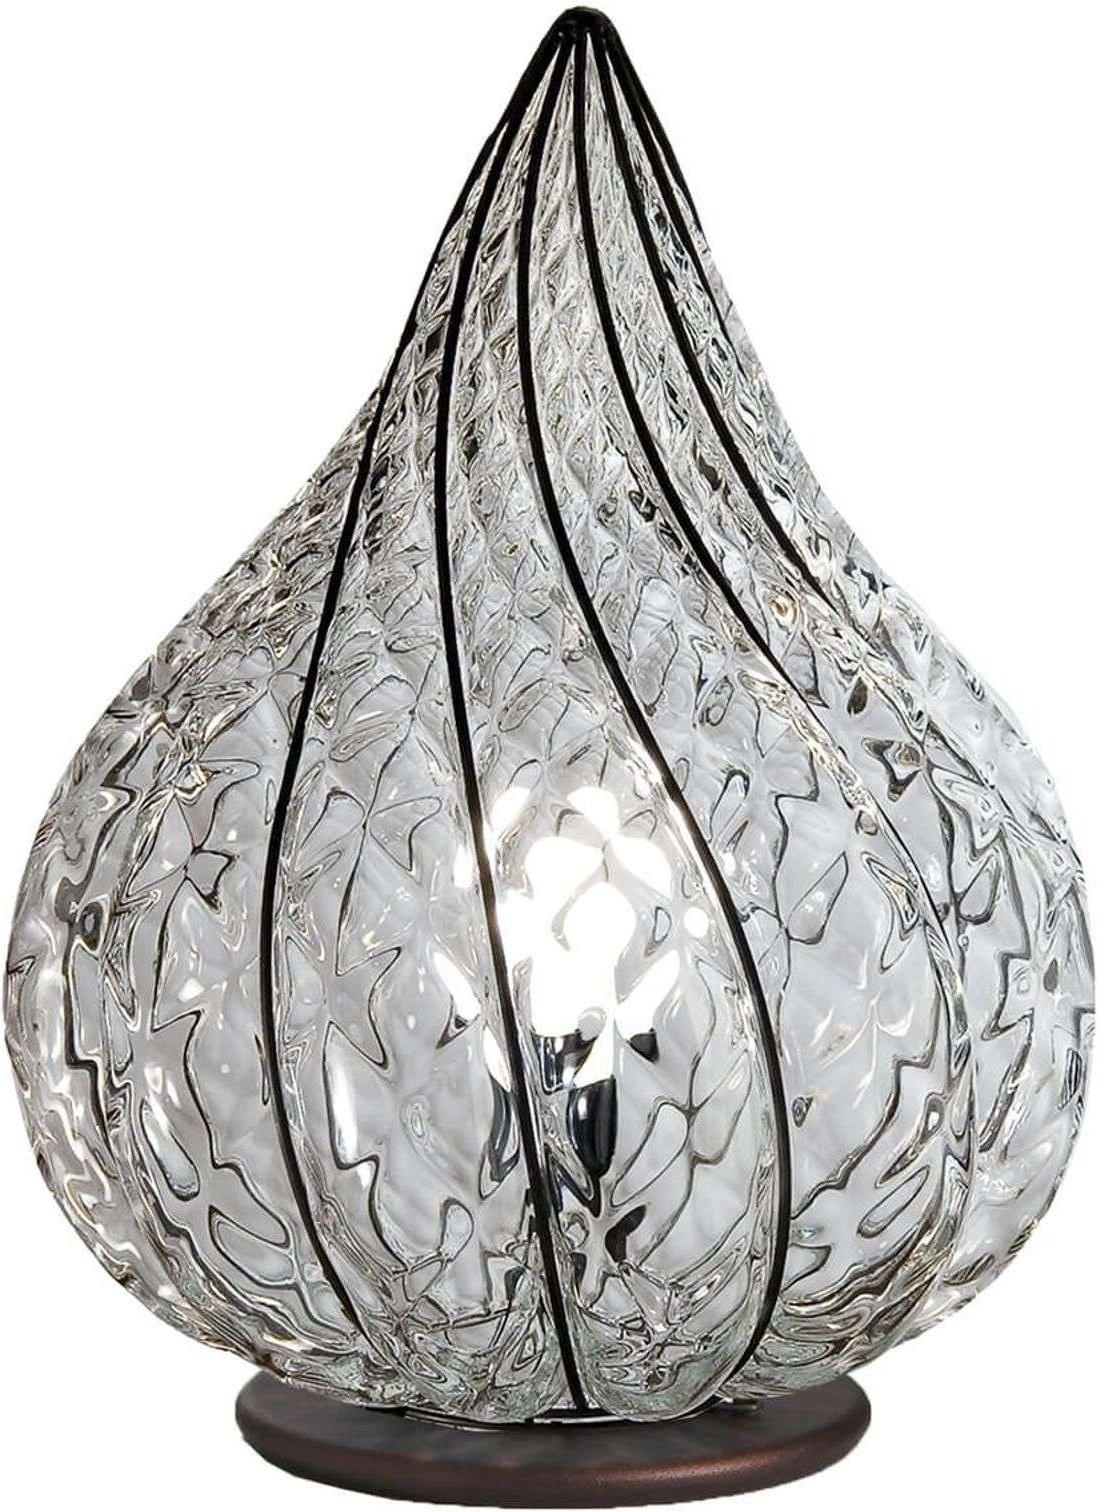 Goccia   handmade table lamp